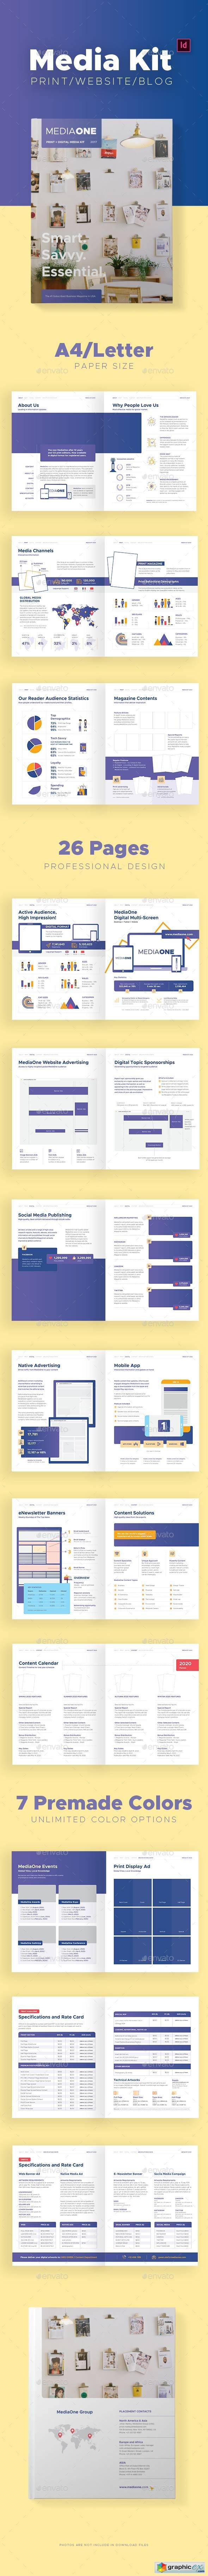 Print And Digital Media Kit Template Free Download Vector Stock